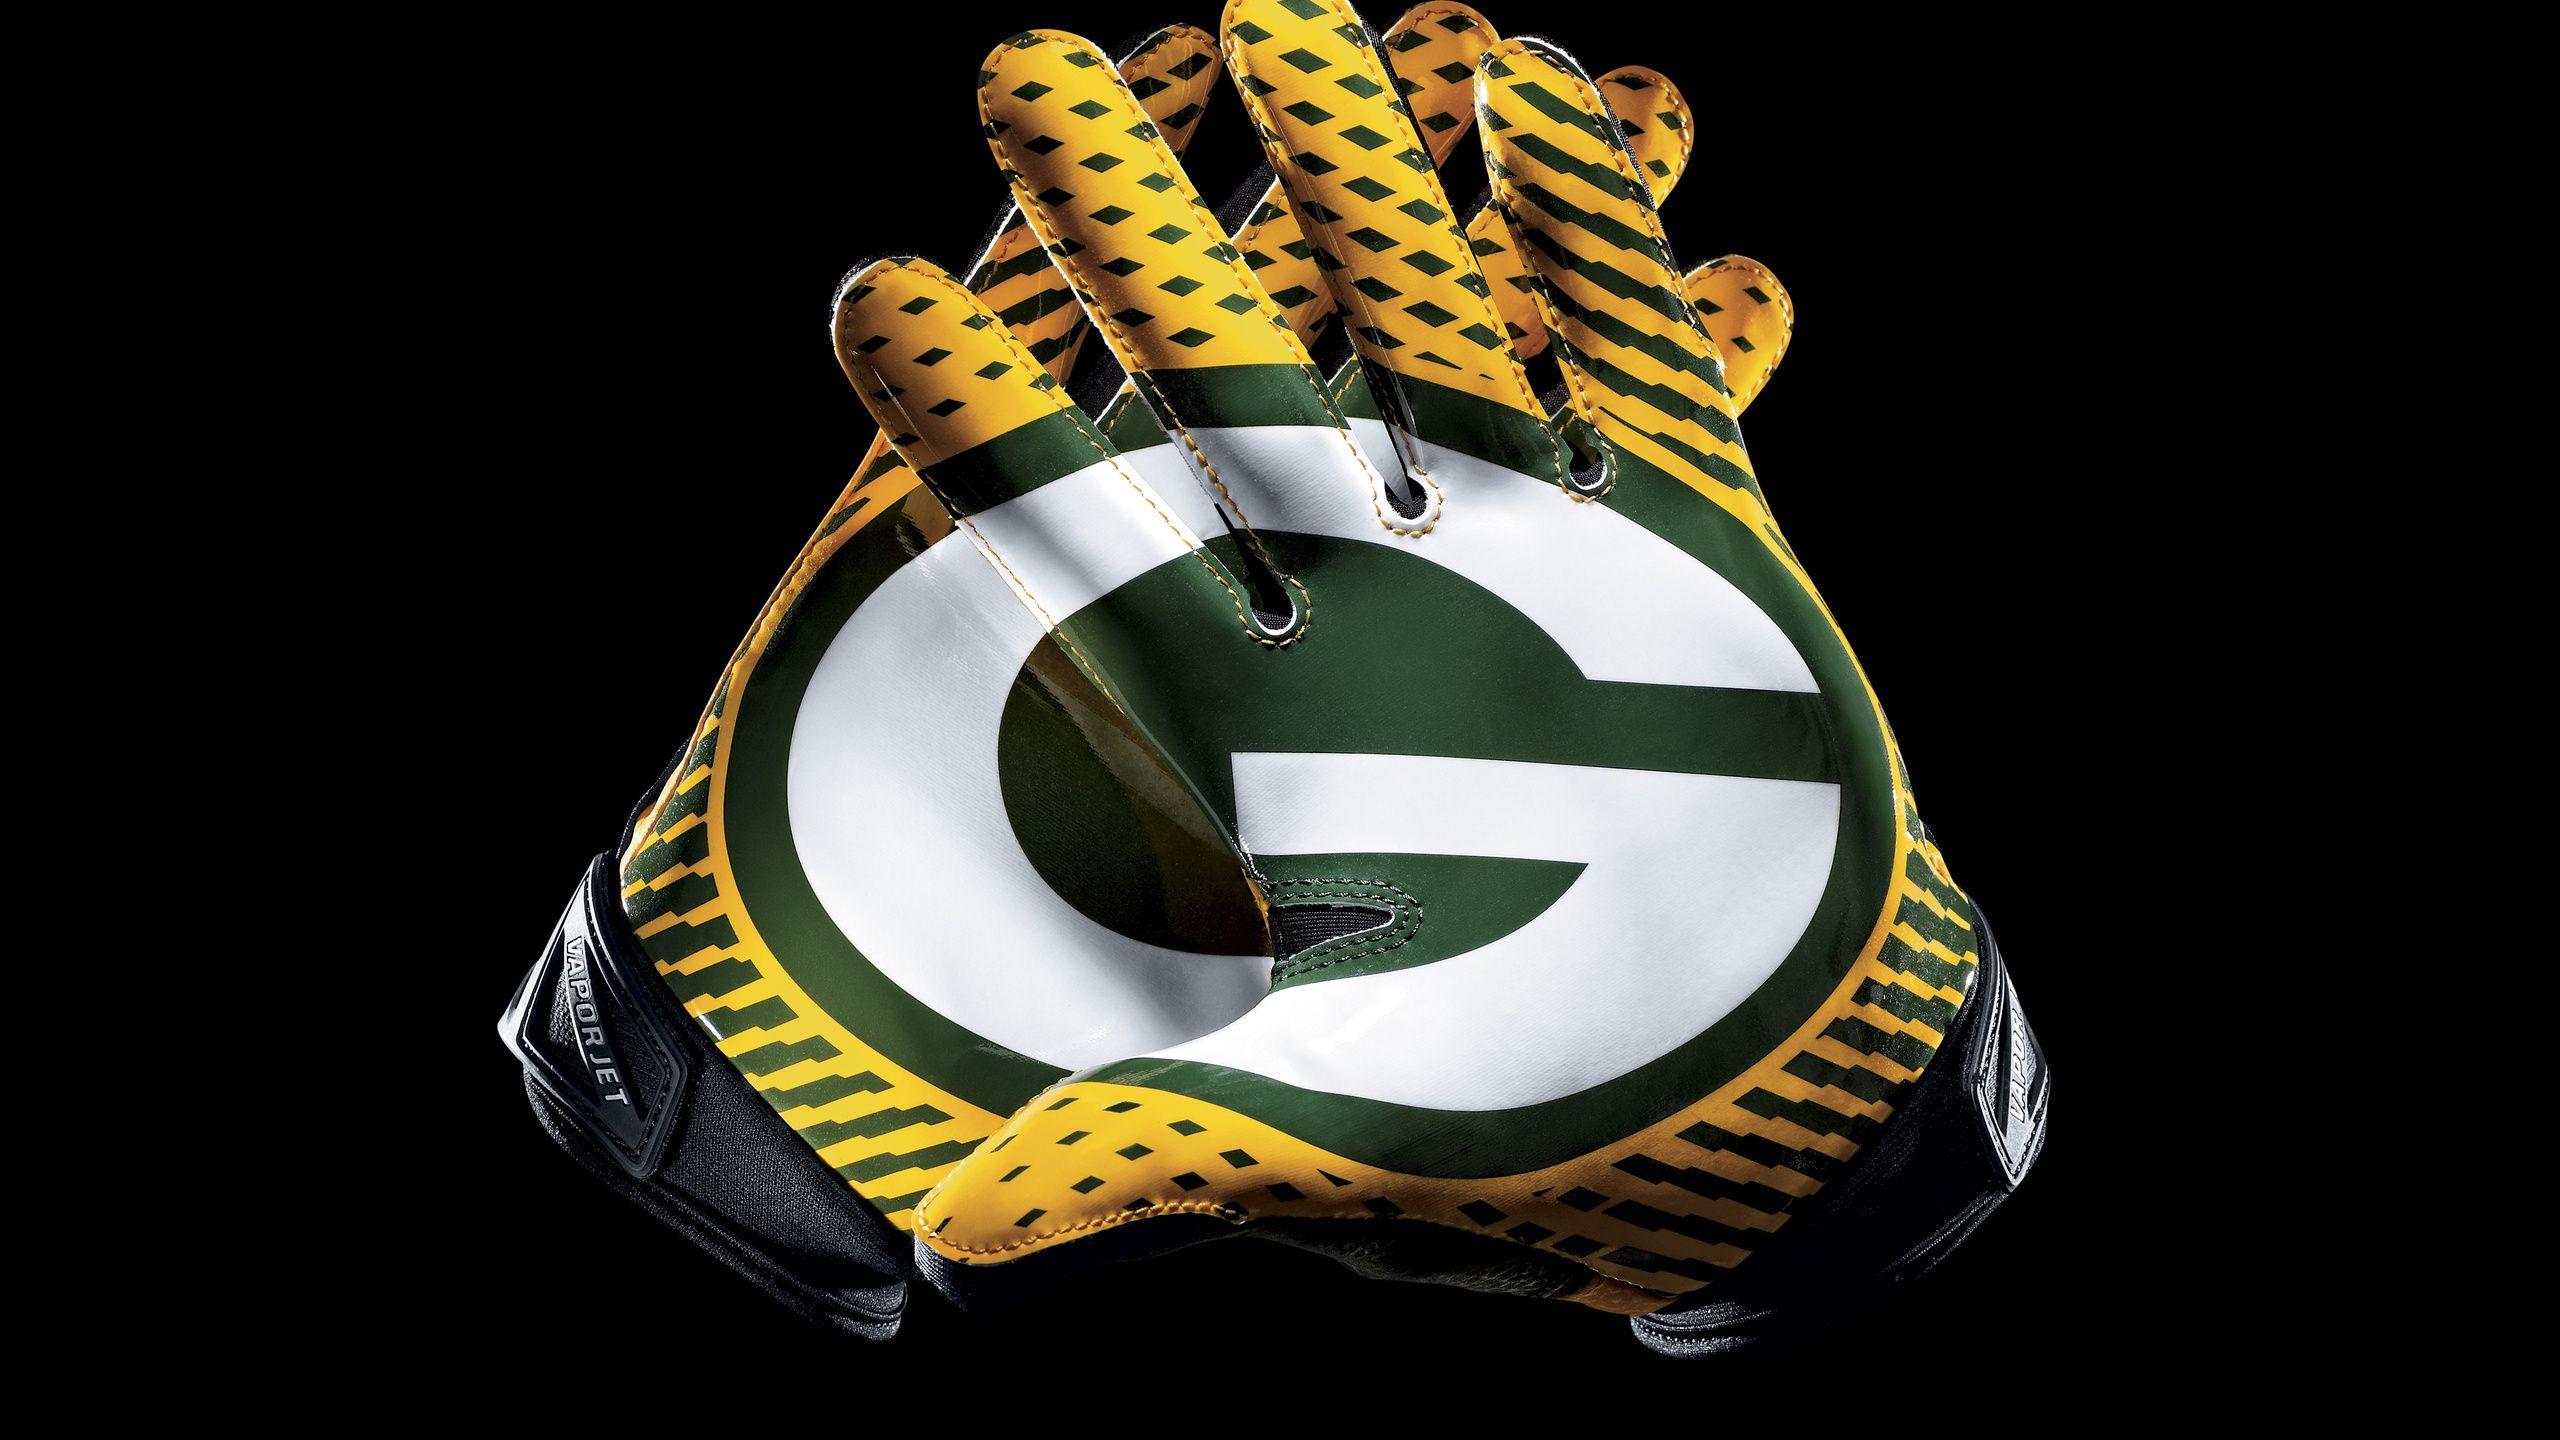 Green Bay Packers D Wallpaper Hd Desktop Wallpaper Green Bay Packers Wallpaper Green Packers Green Bay Packers